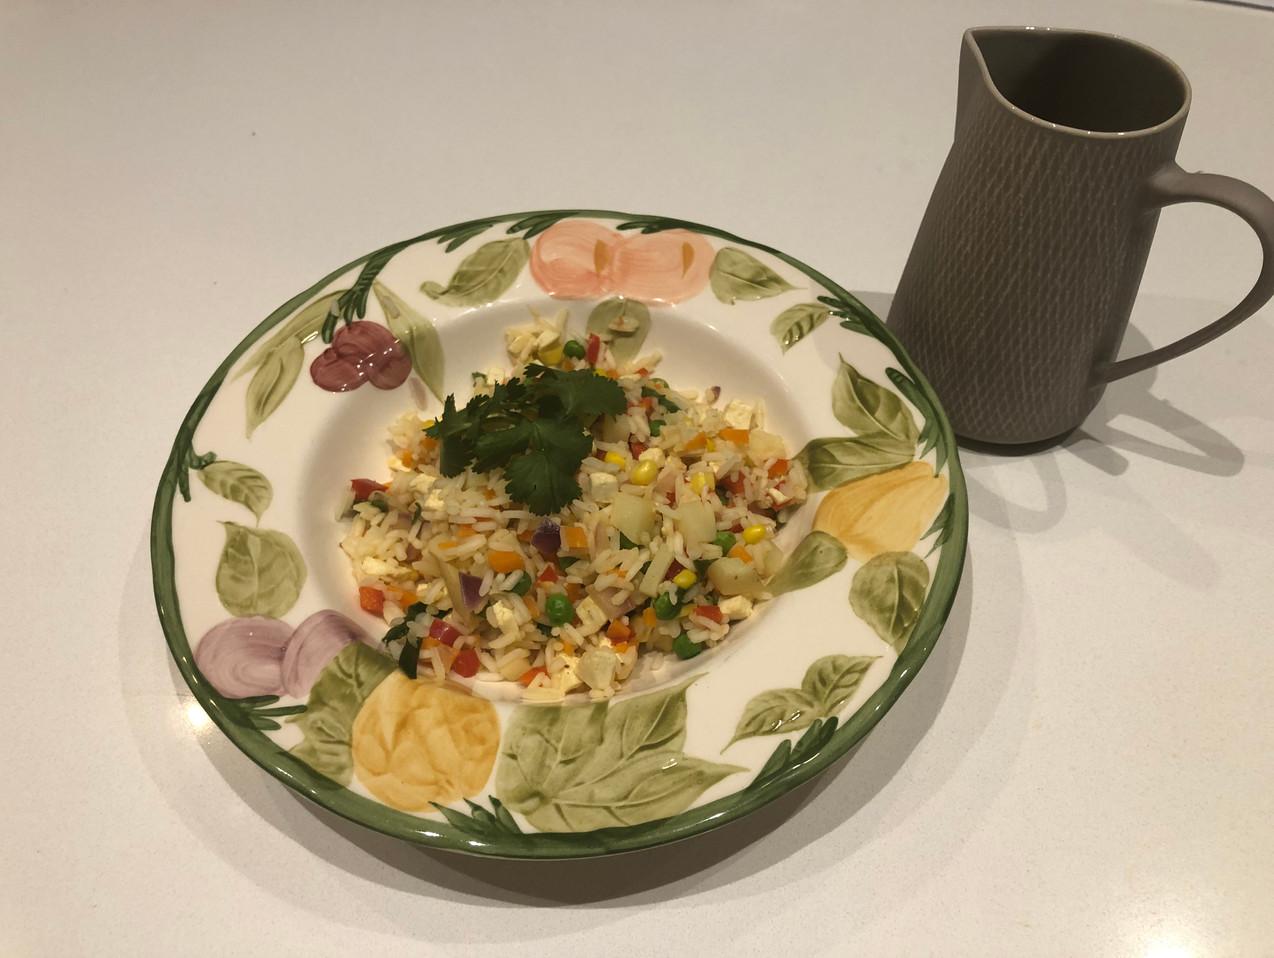 Fried rice image.JPG